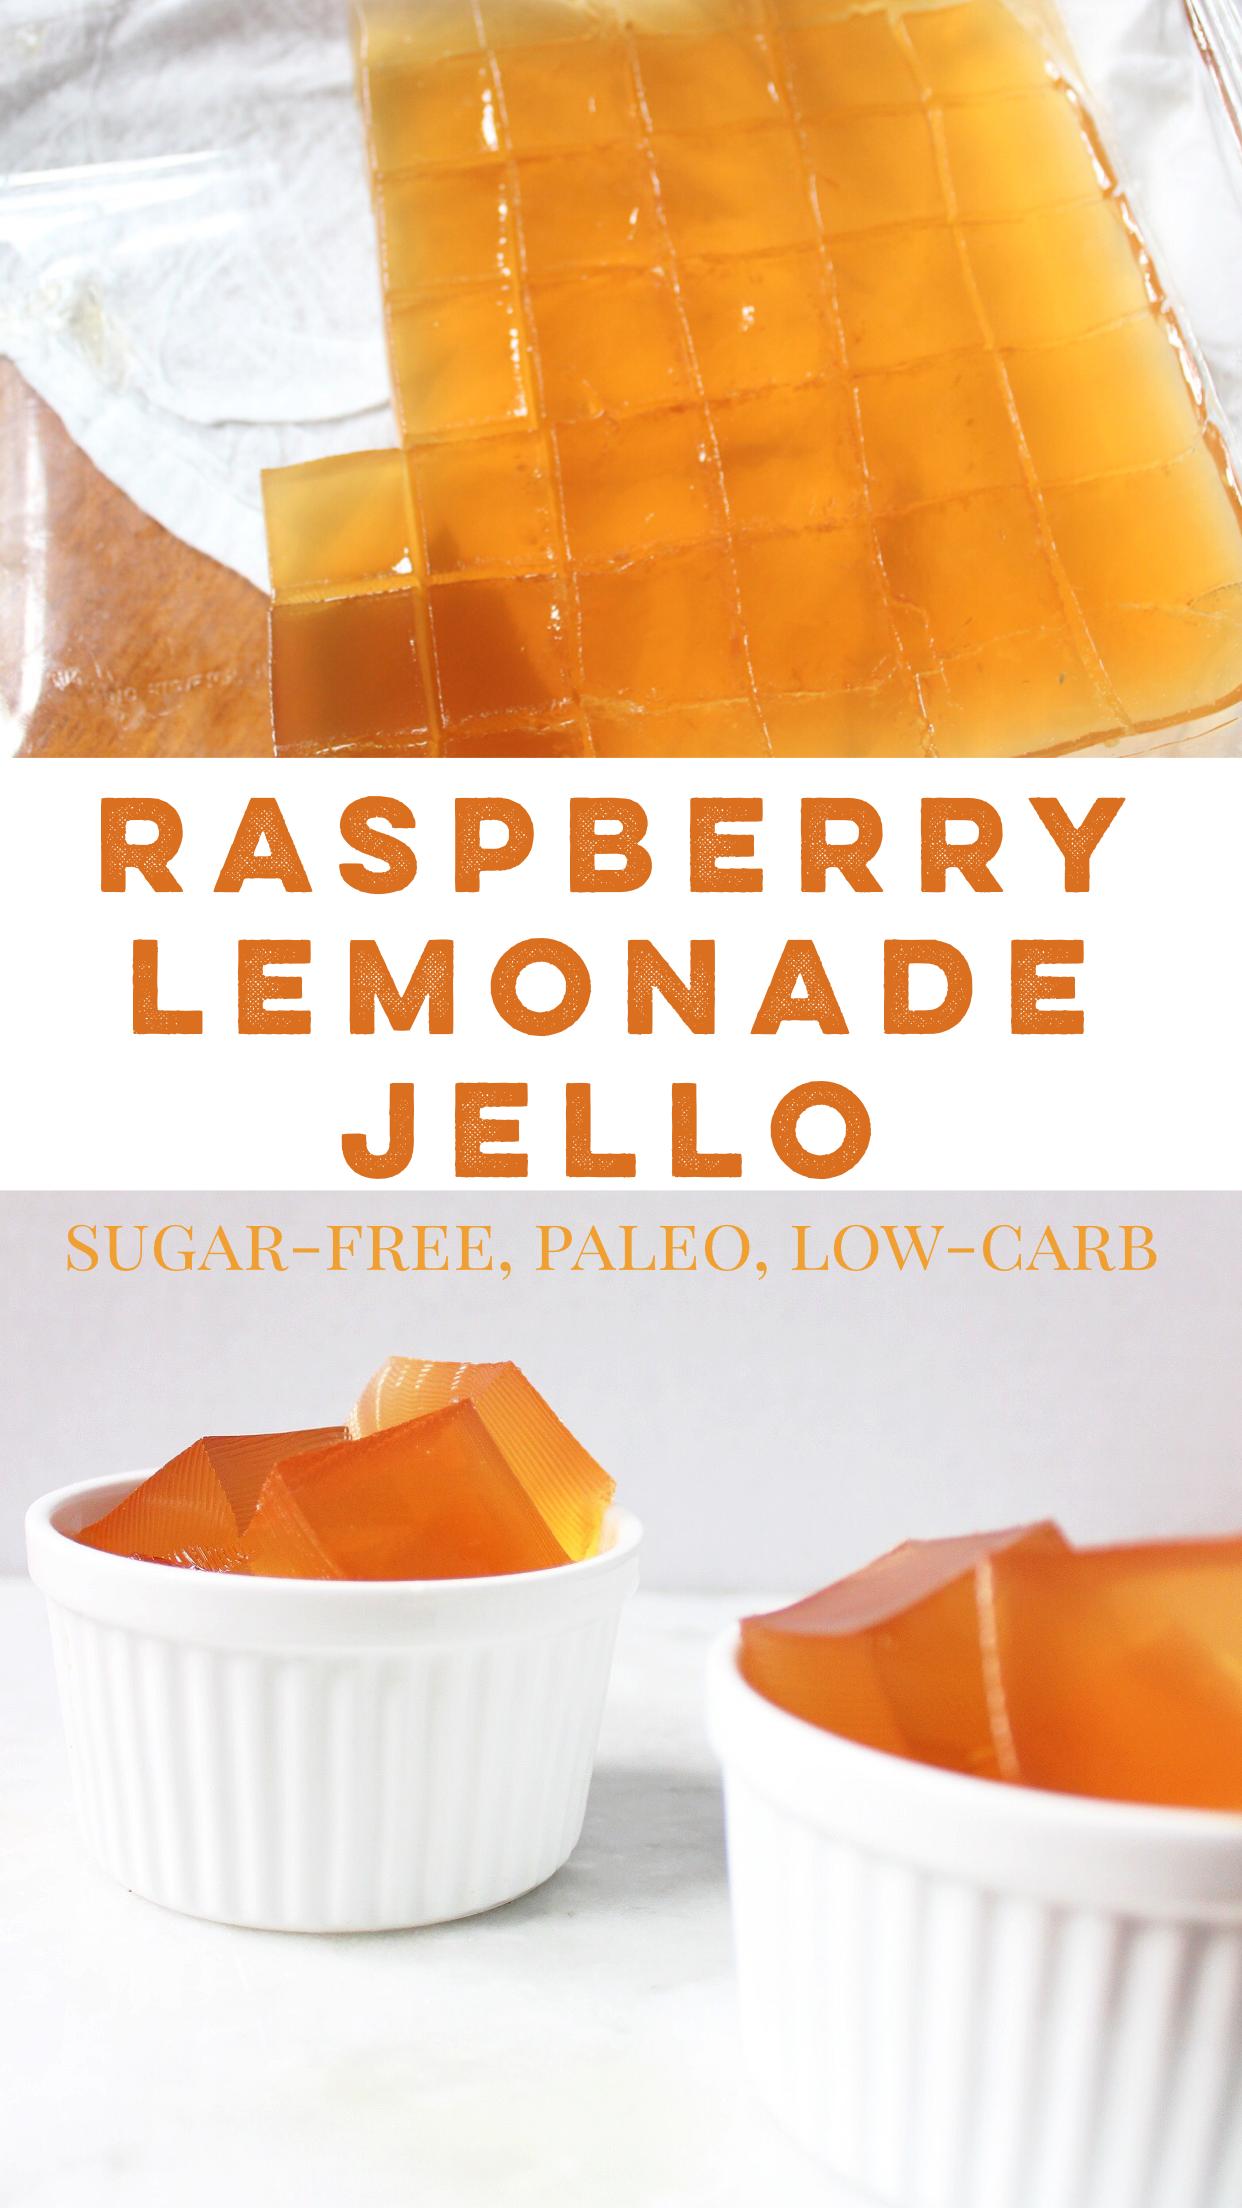 paleo raspberry lemonade jello